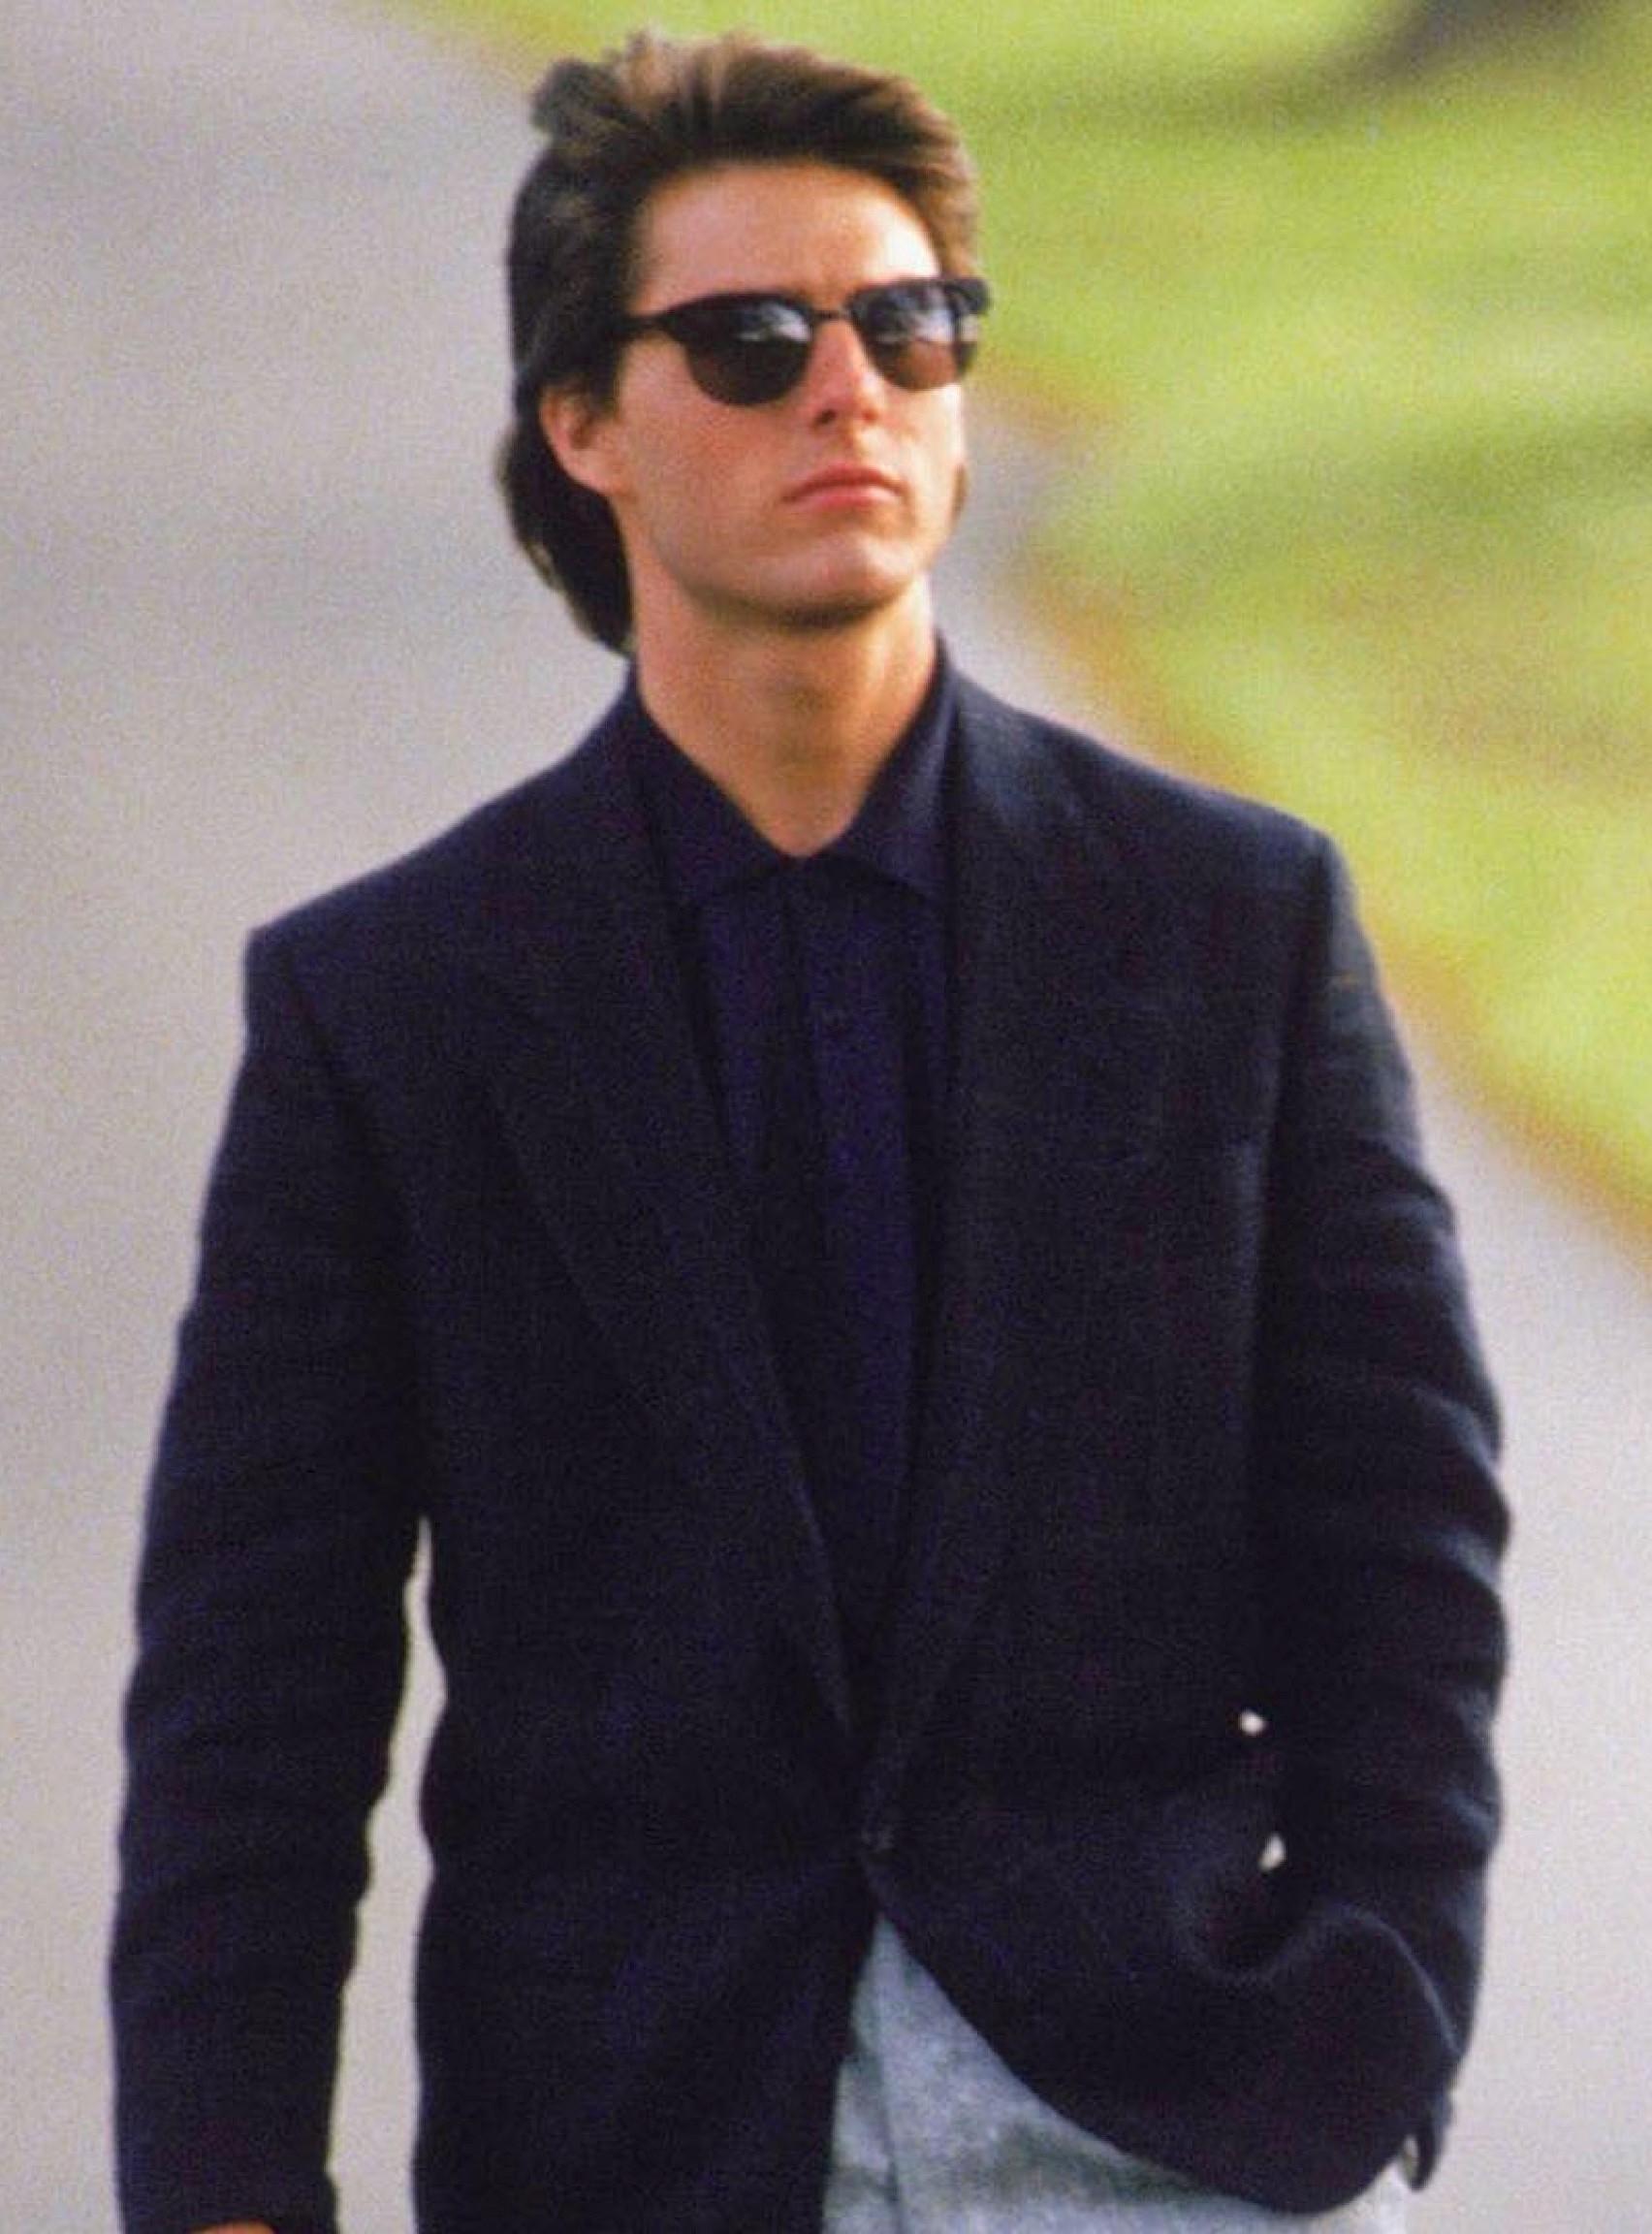 b7b34412ed17 Tom Cruise as Charlie Babbitt in Rain Man (1988)